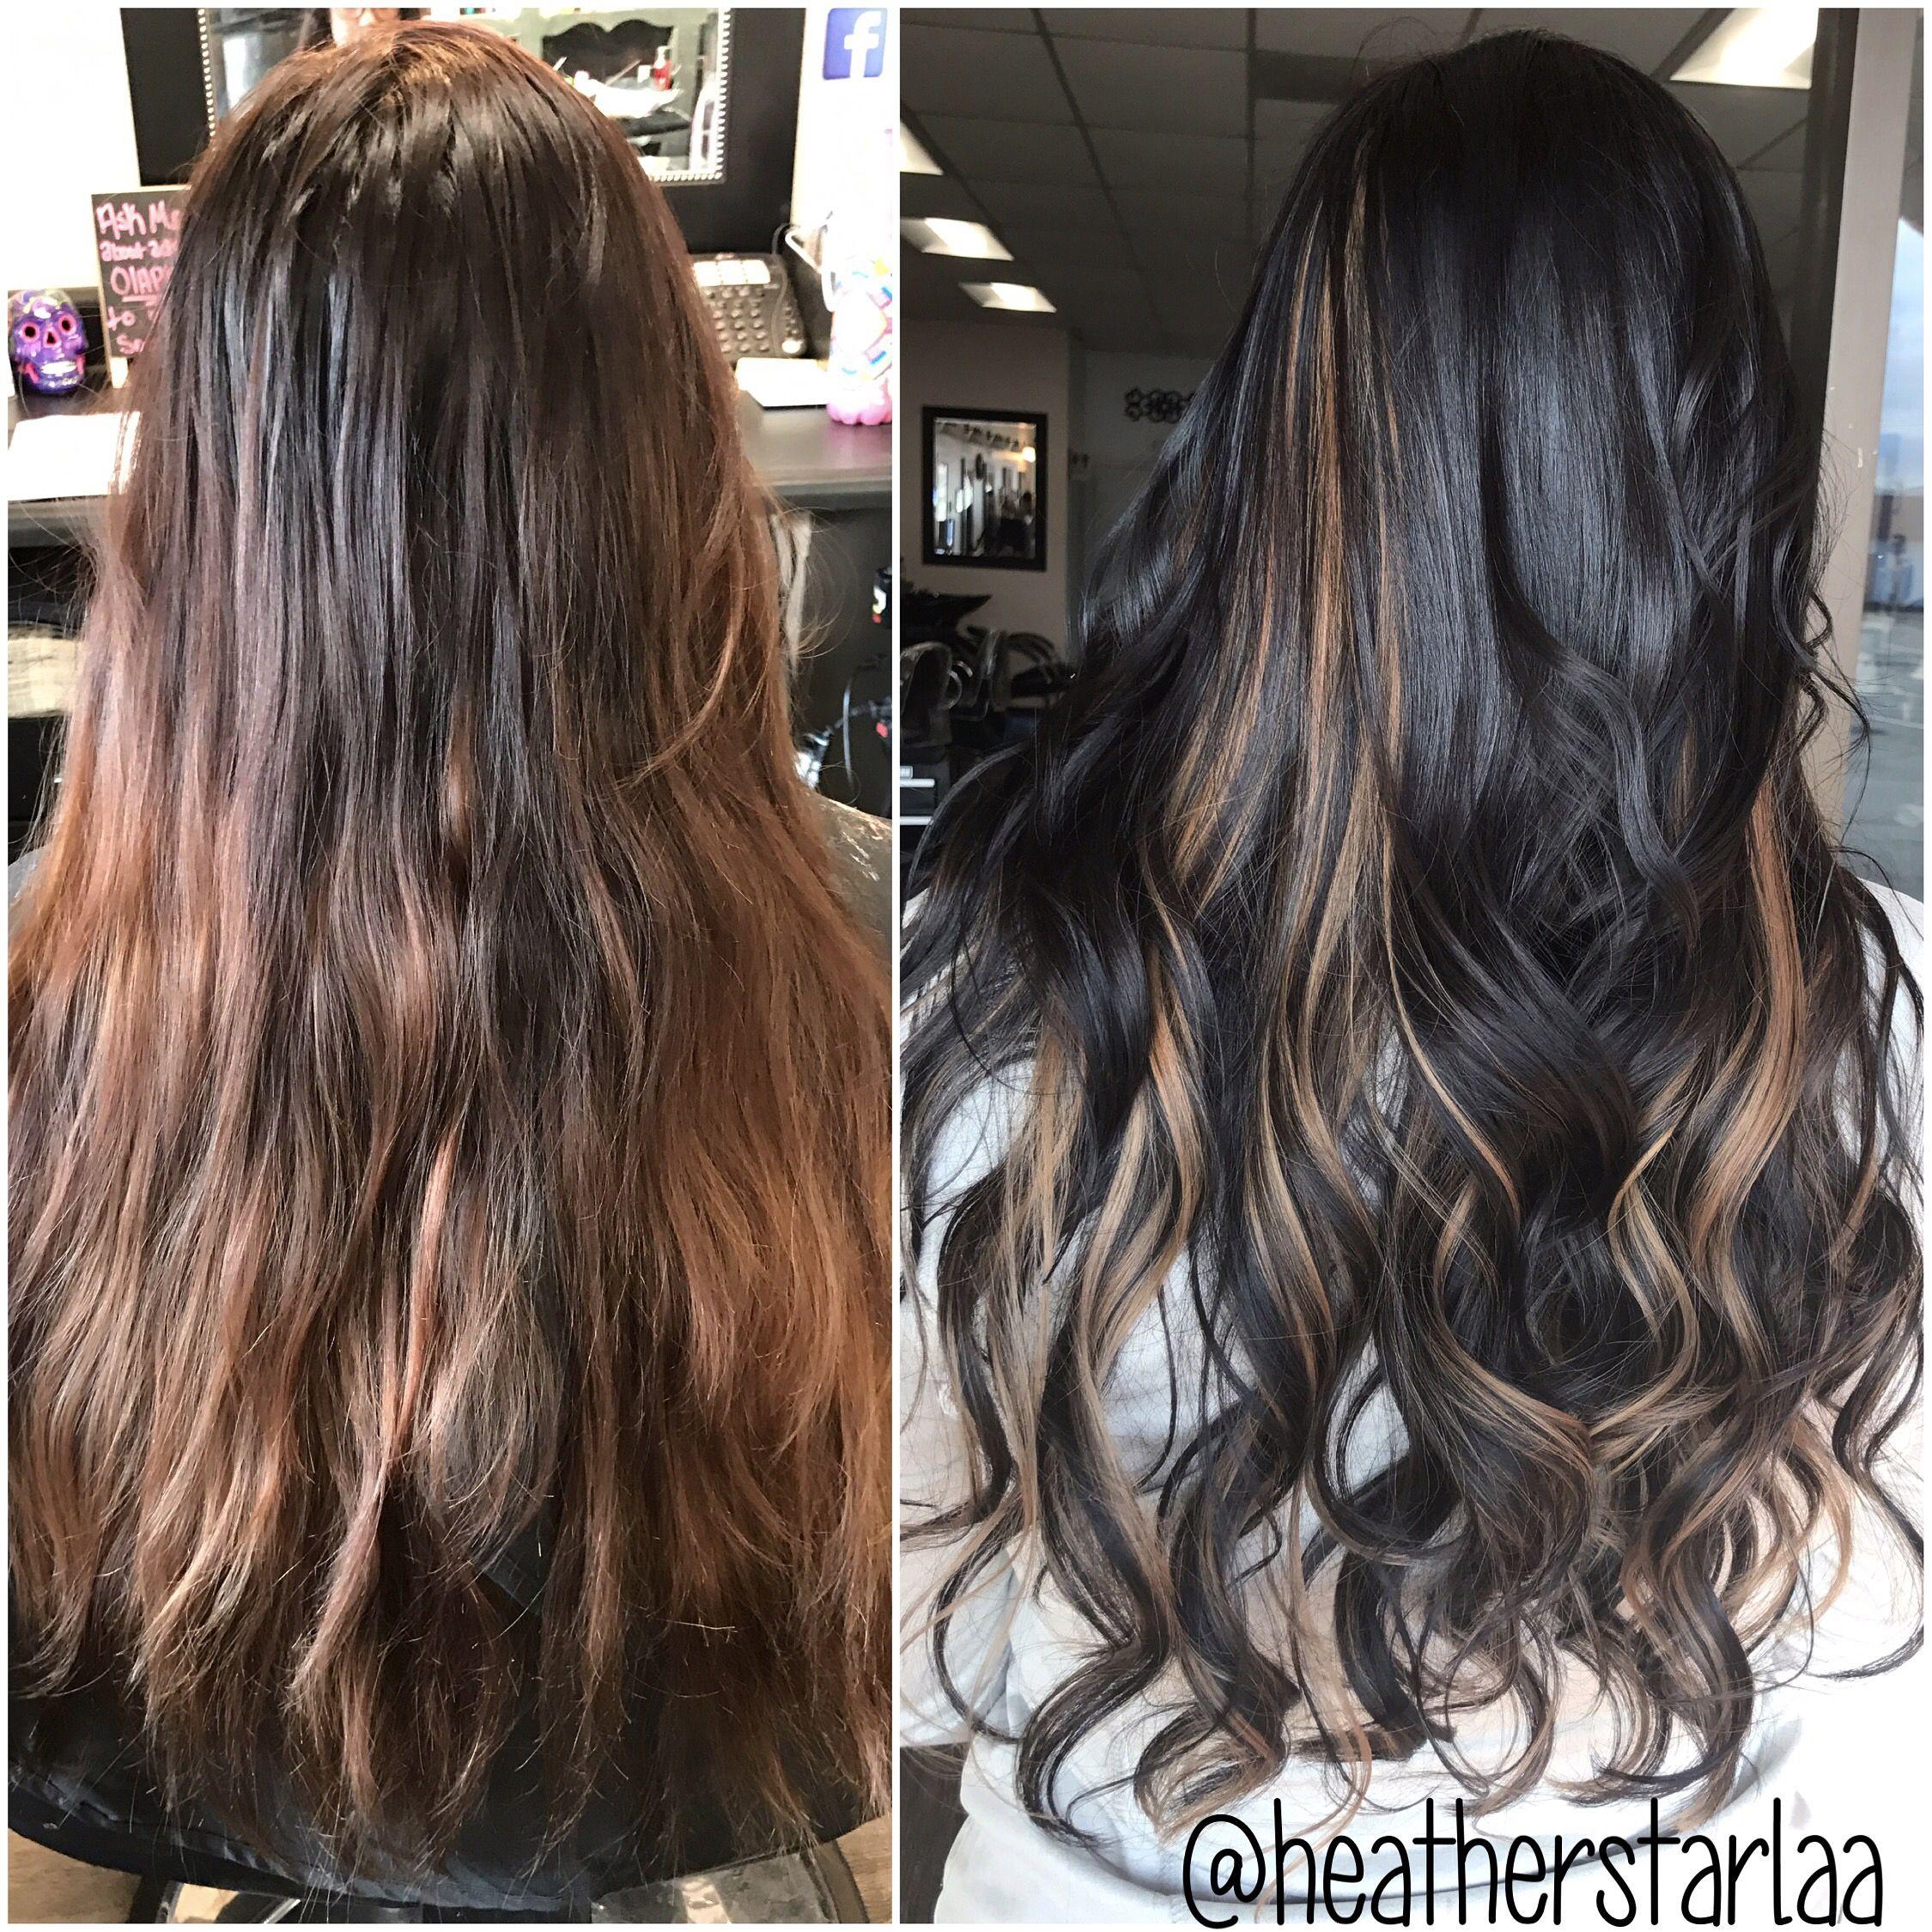 Dark Brown Hair Honey Carmel Peekaboo Highlights Long Hair Curled Hair Long Hair Styles Honey Hair Dark Hair With Highlights